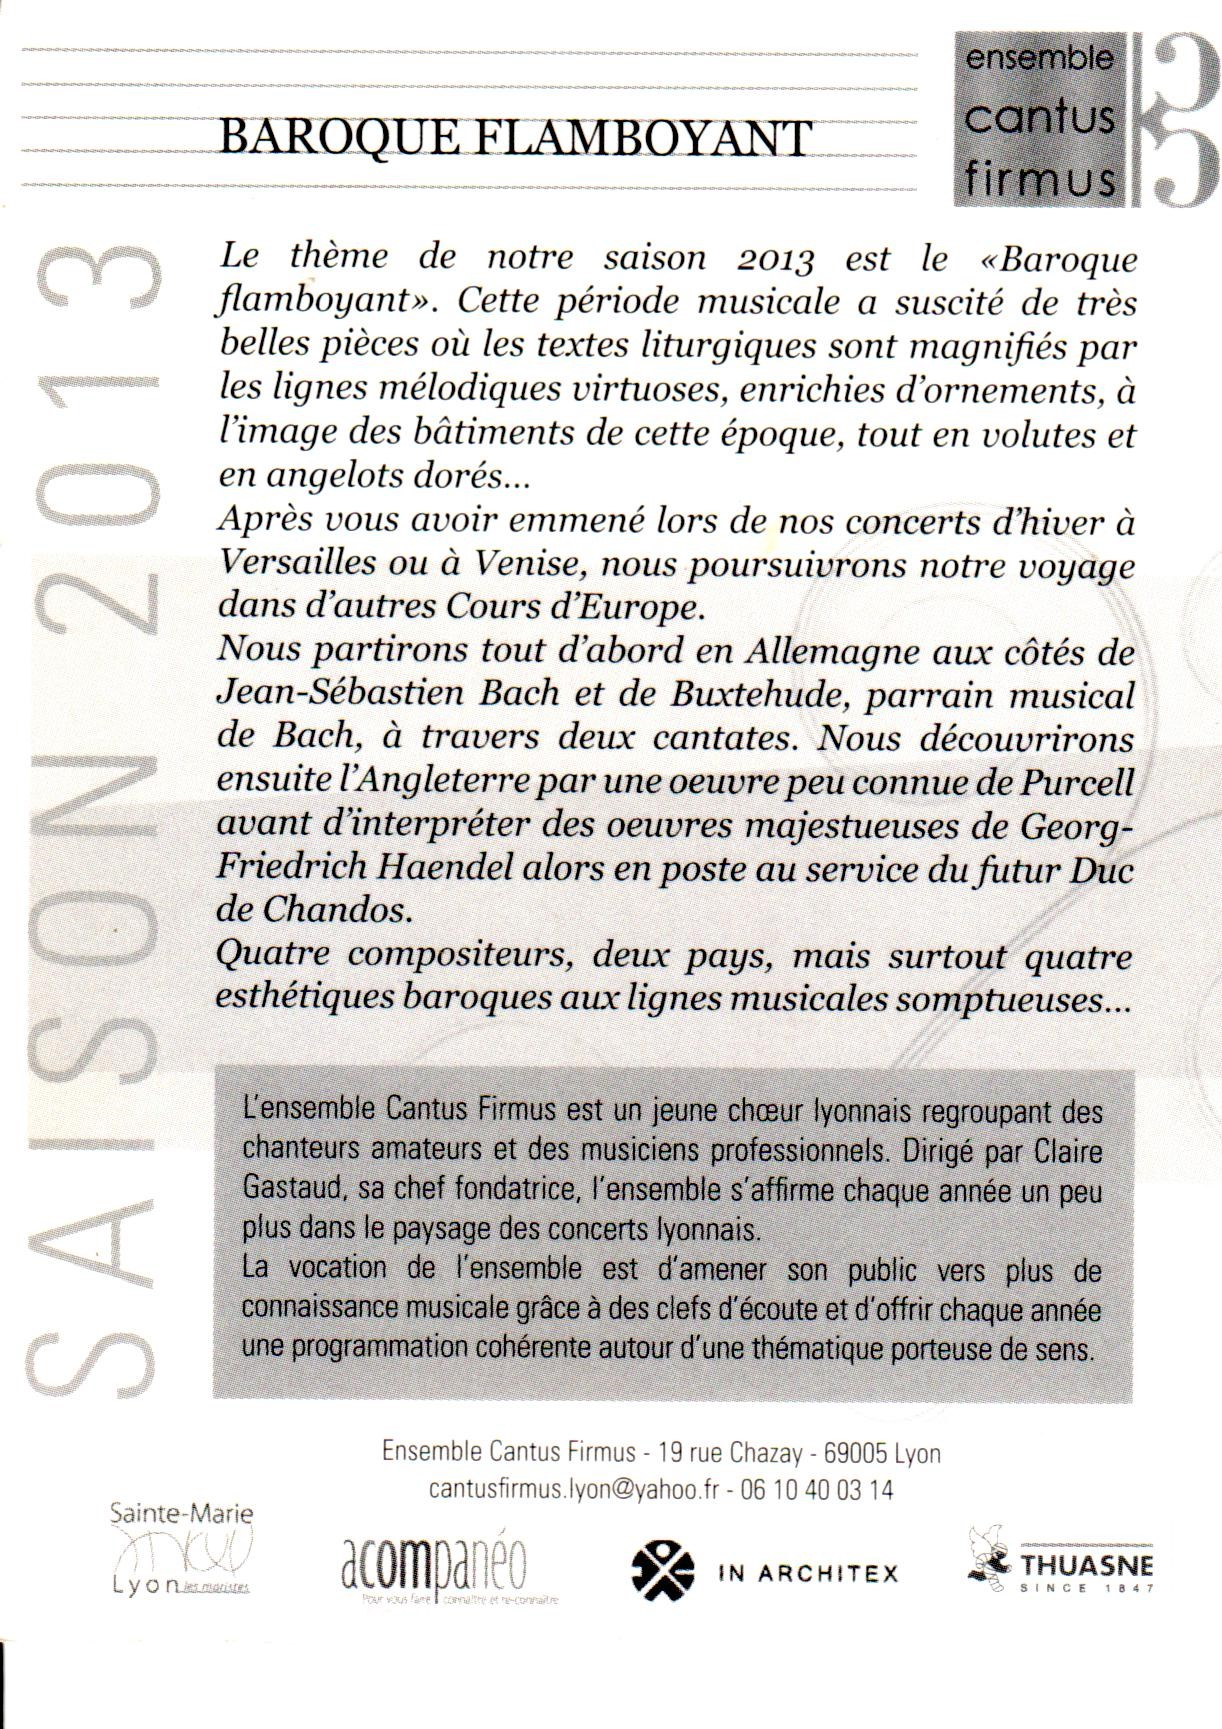 2013-10_BAROQUE FLAMBOYANT (2)